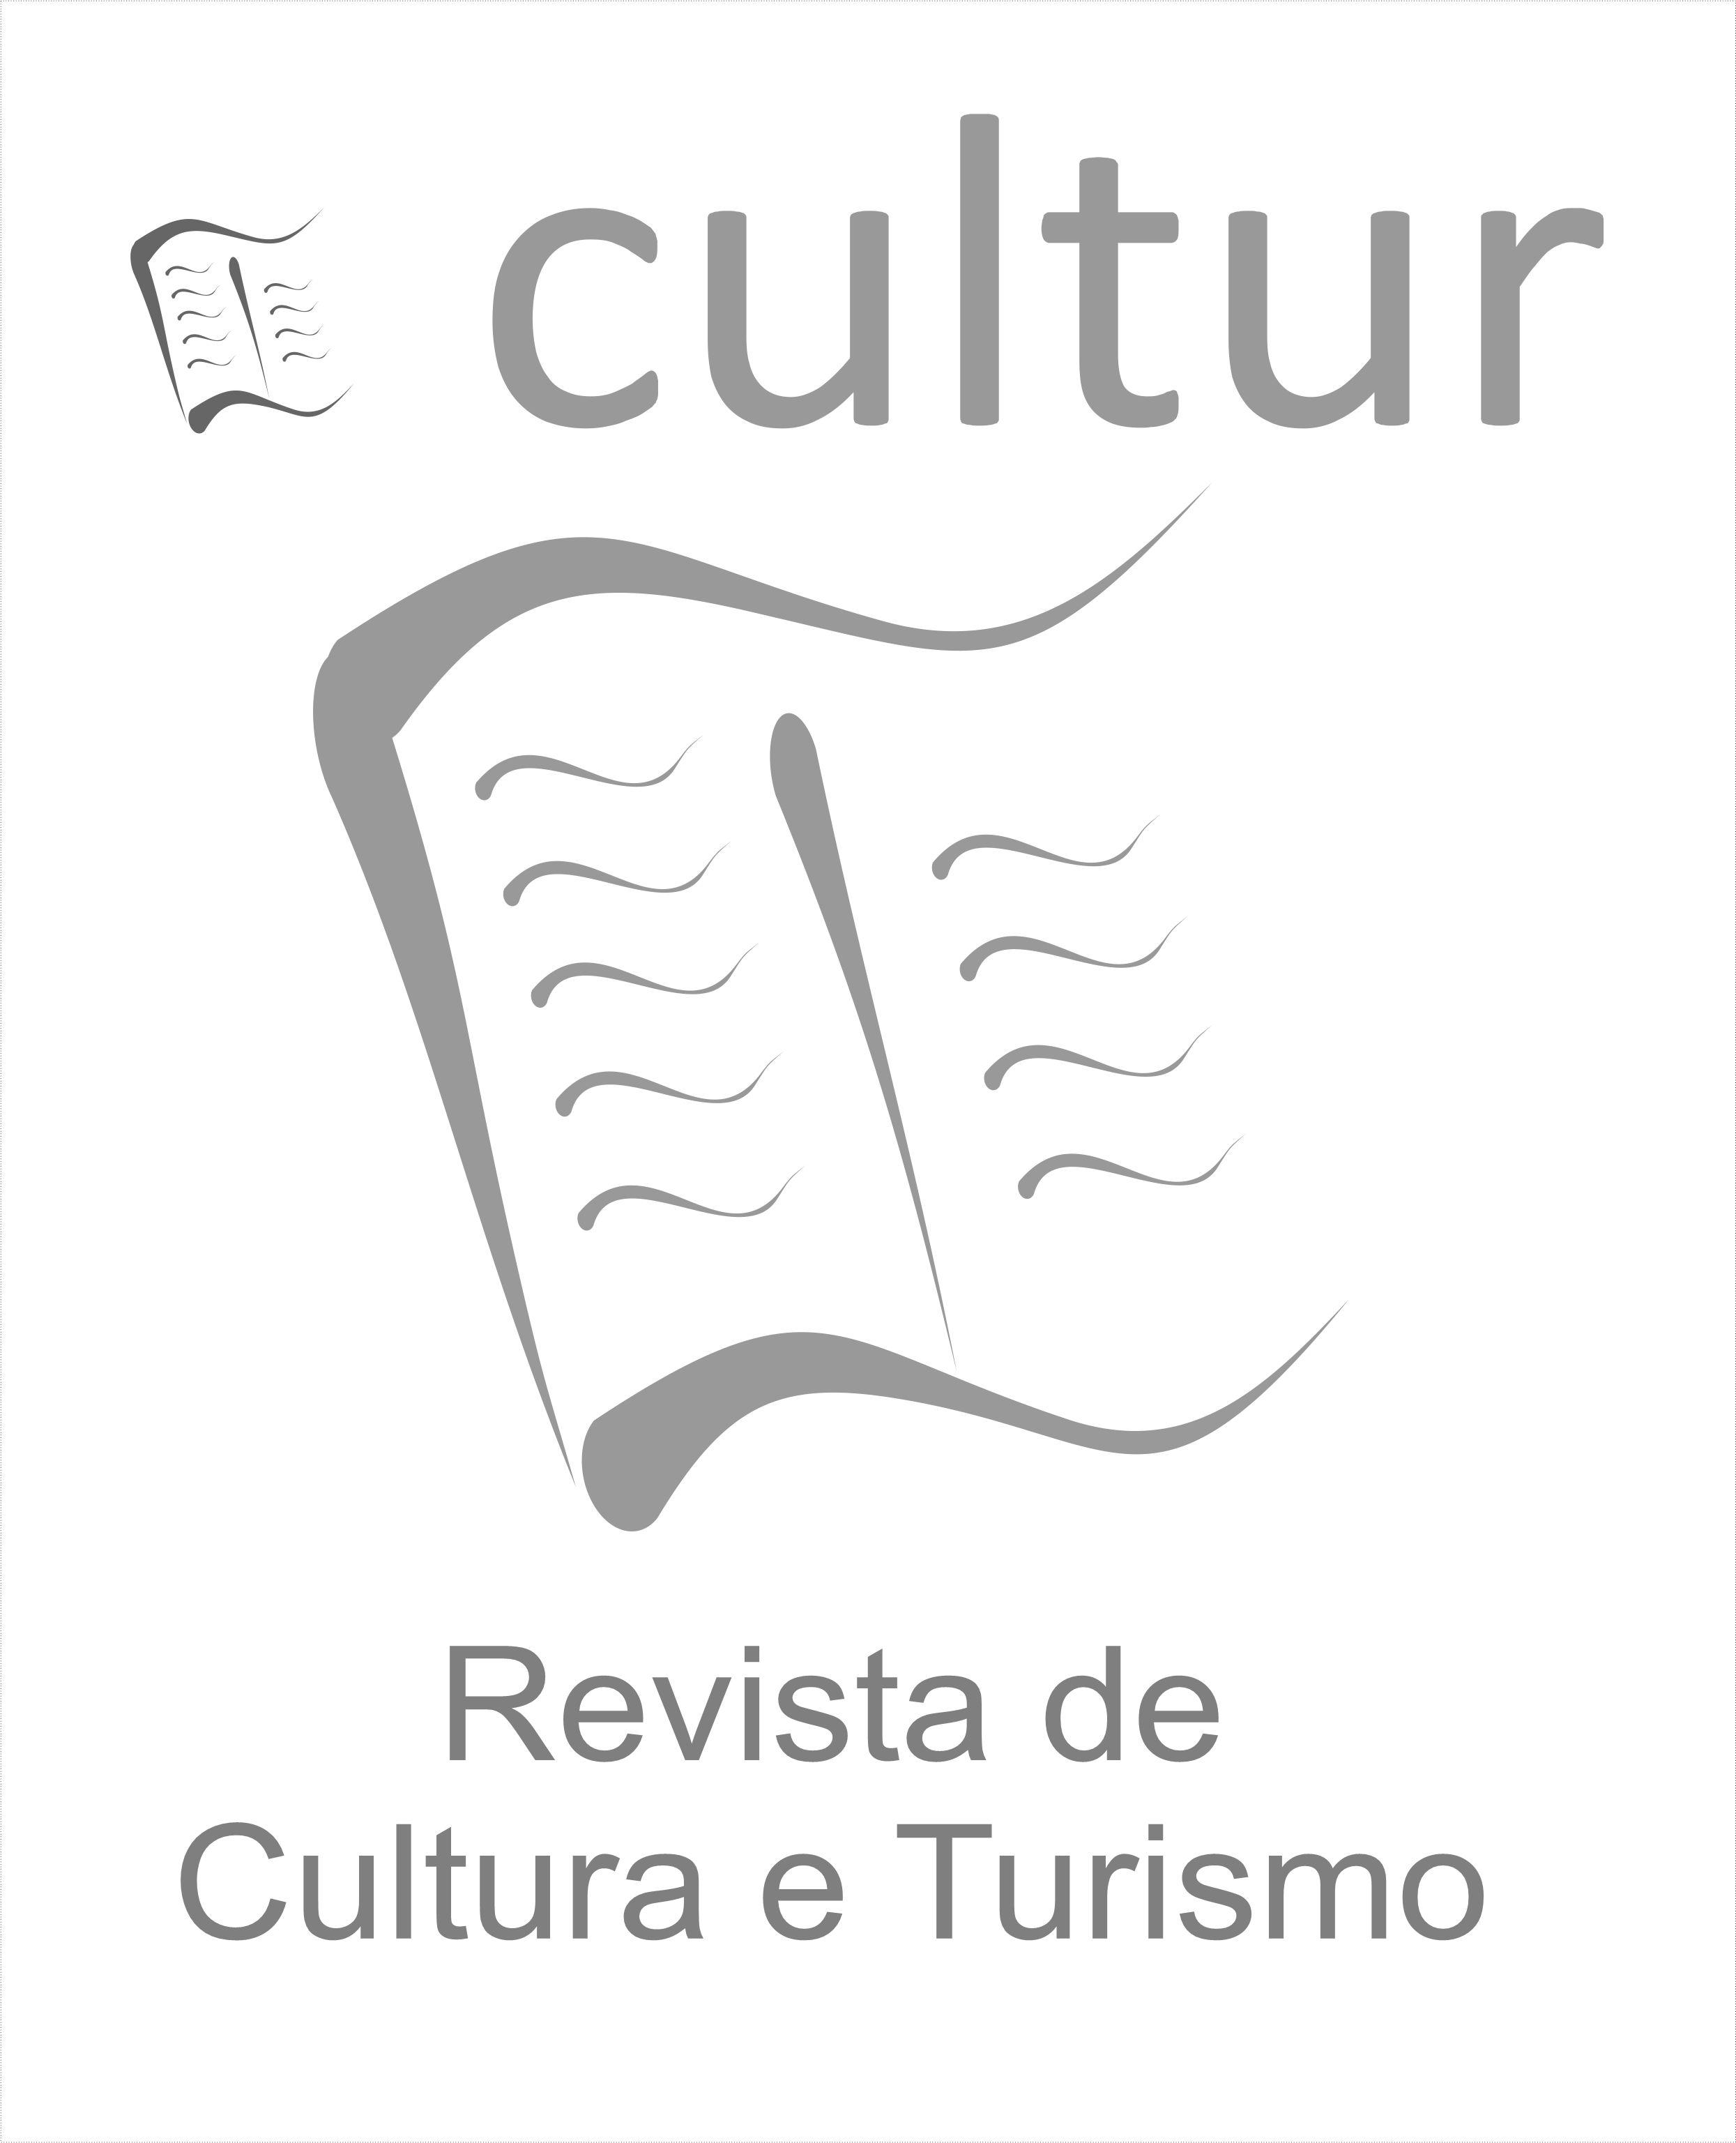 CULTUR - Revista de Cultura e Turismo